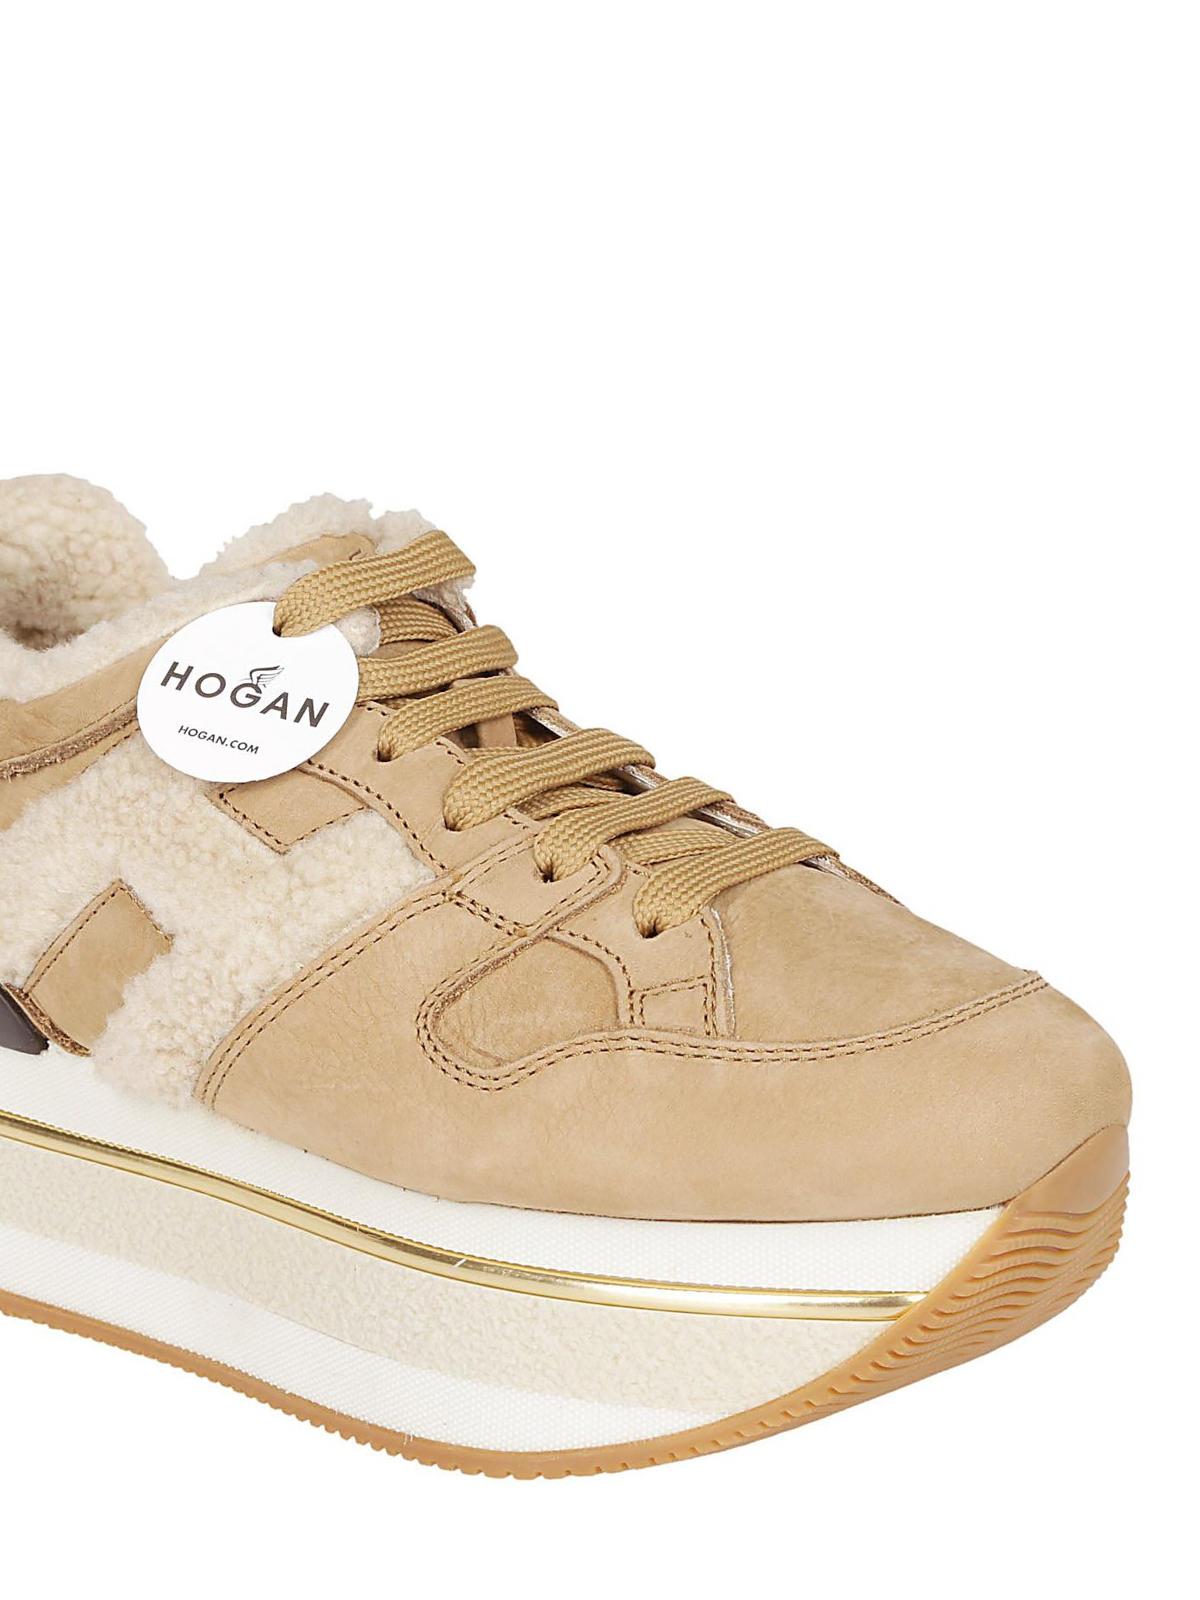 Trainers Hogan - Maxi H222 nubuck sneakers - HXW3940AQ70HTA0XFI